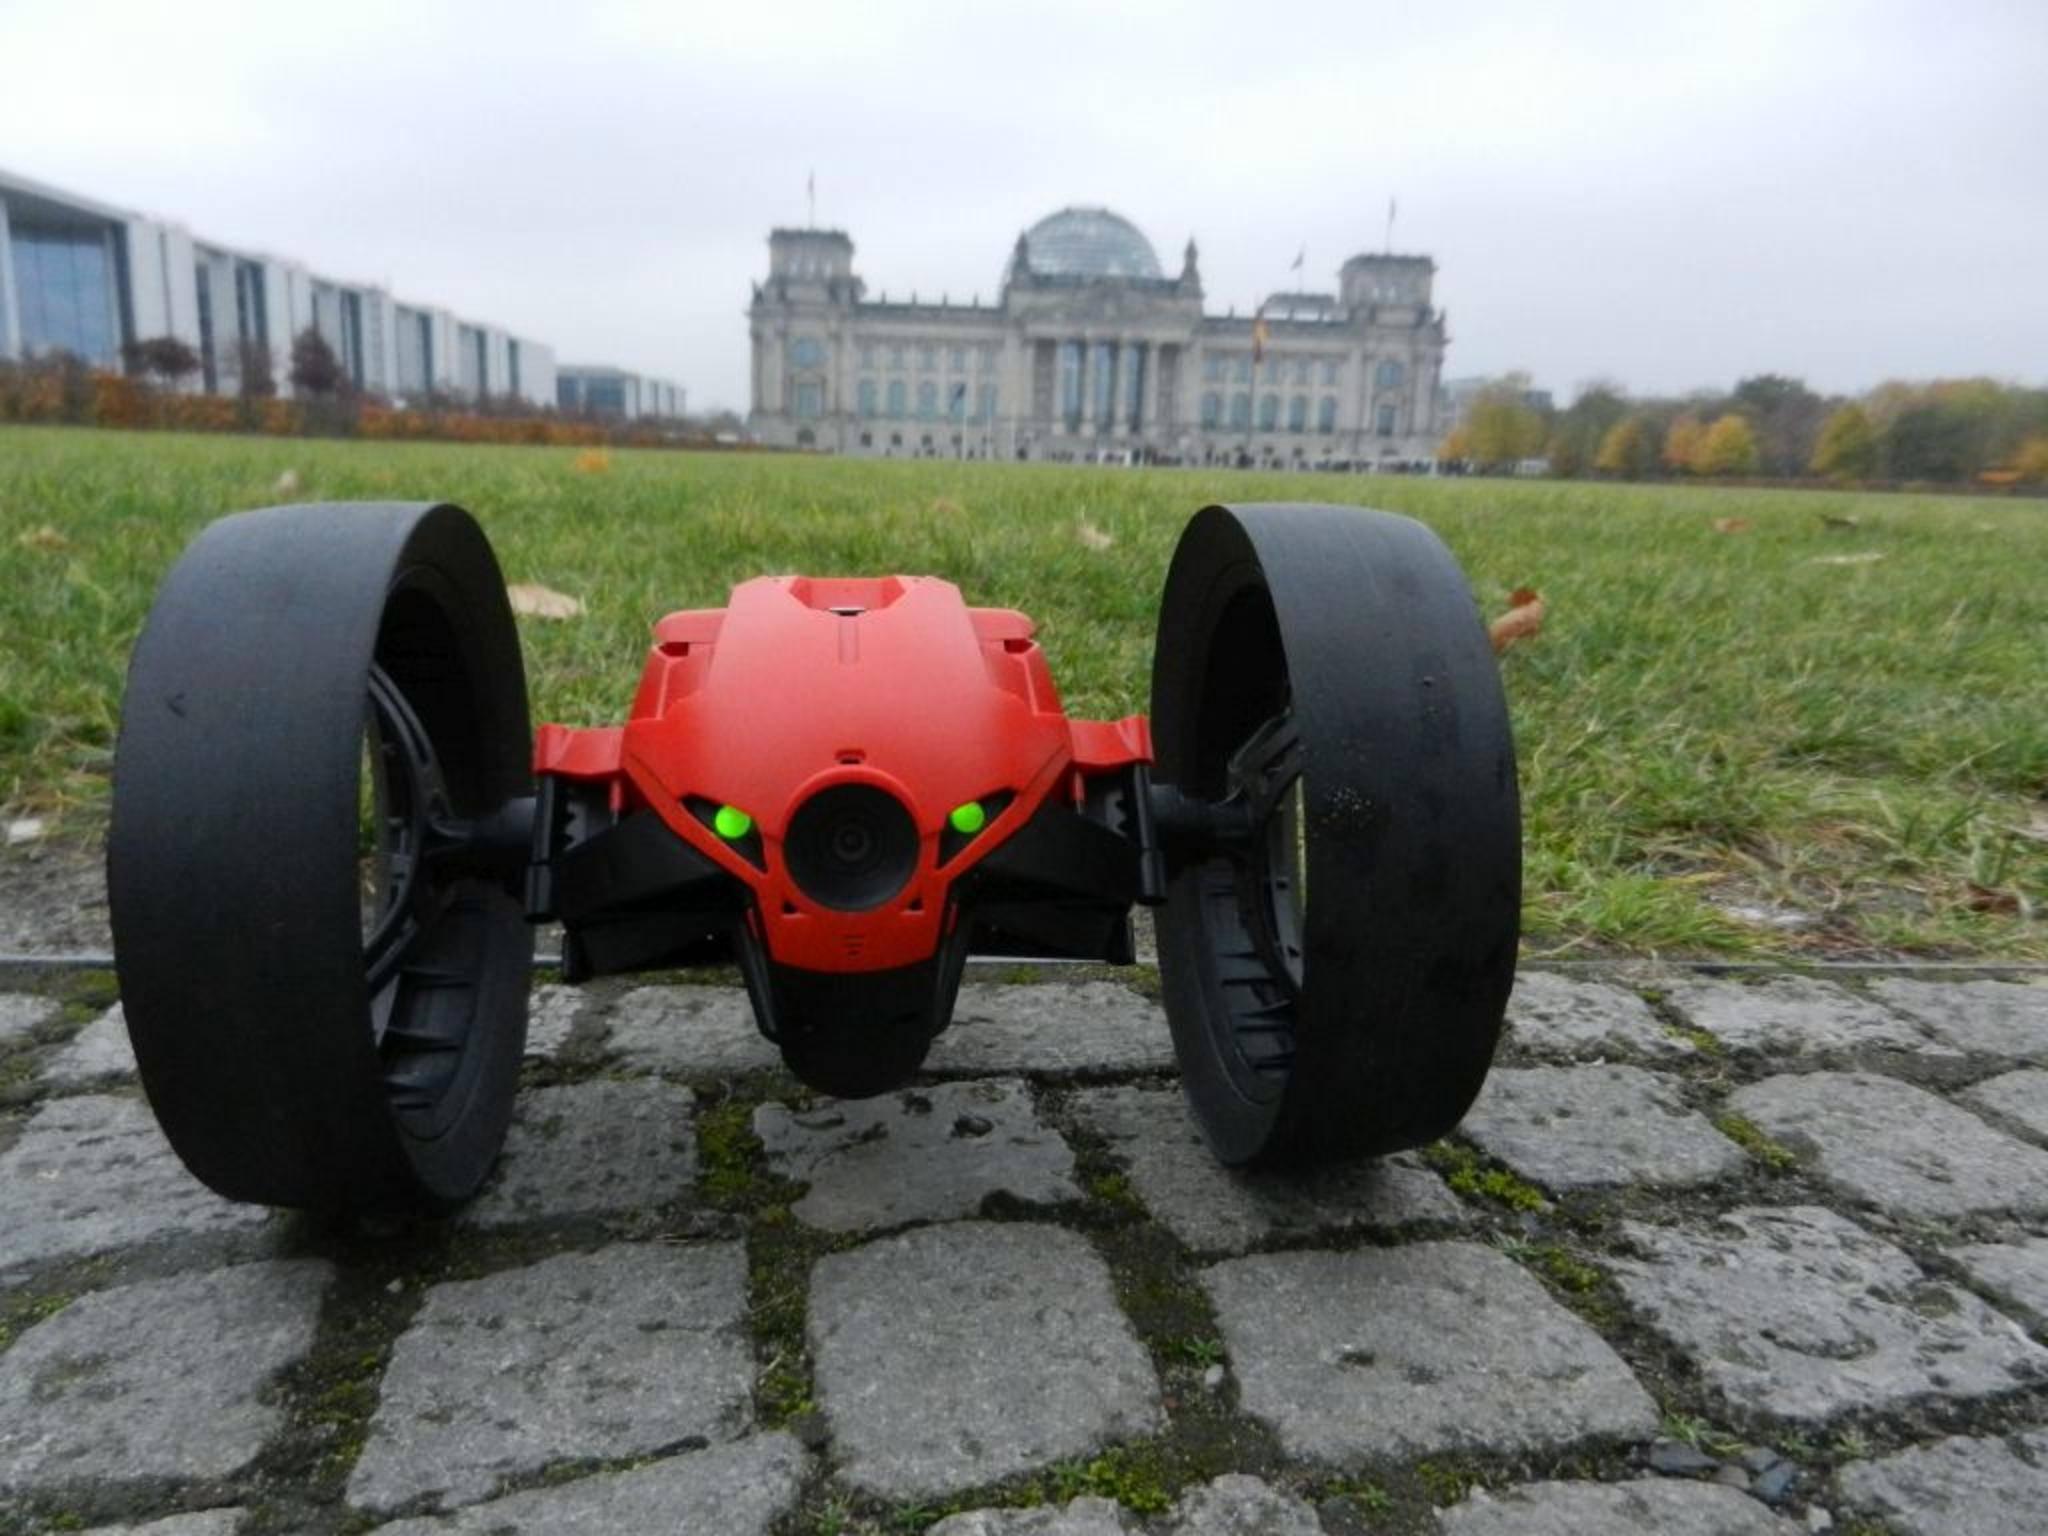 Die Parrot Jumping Race Drone bringt viele spaßige Features mit.